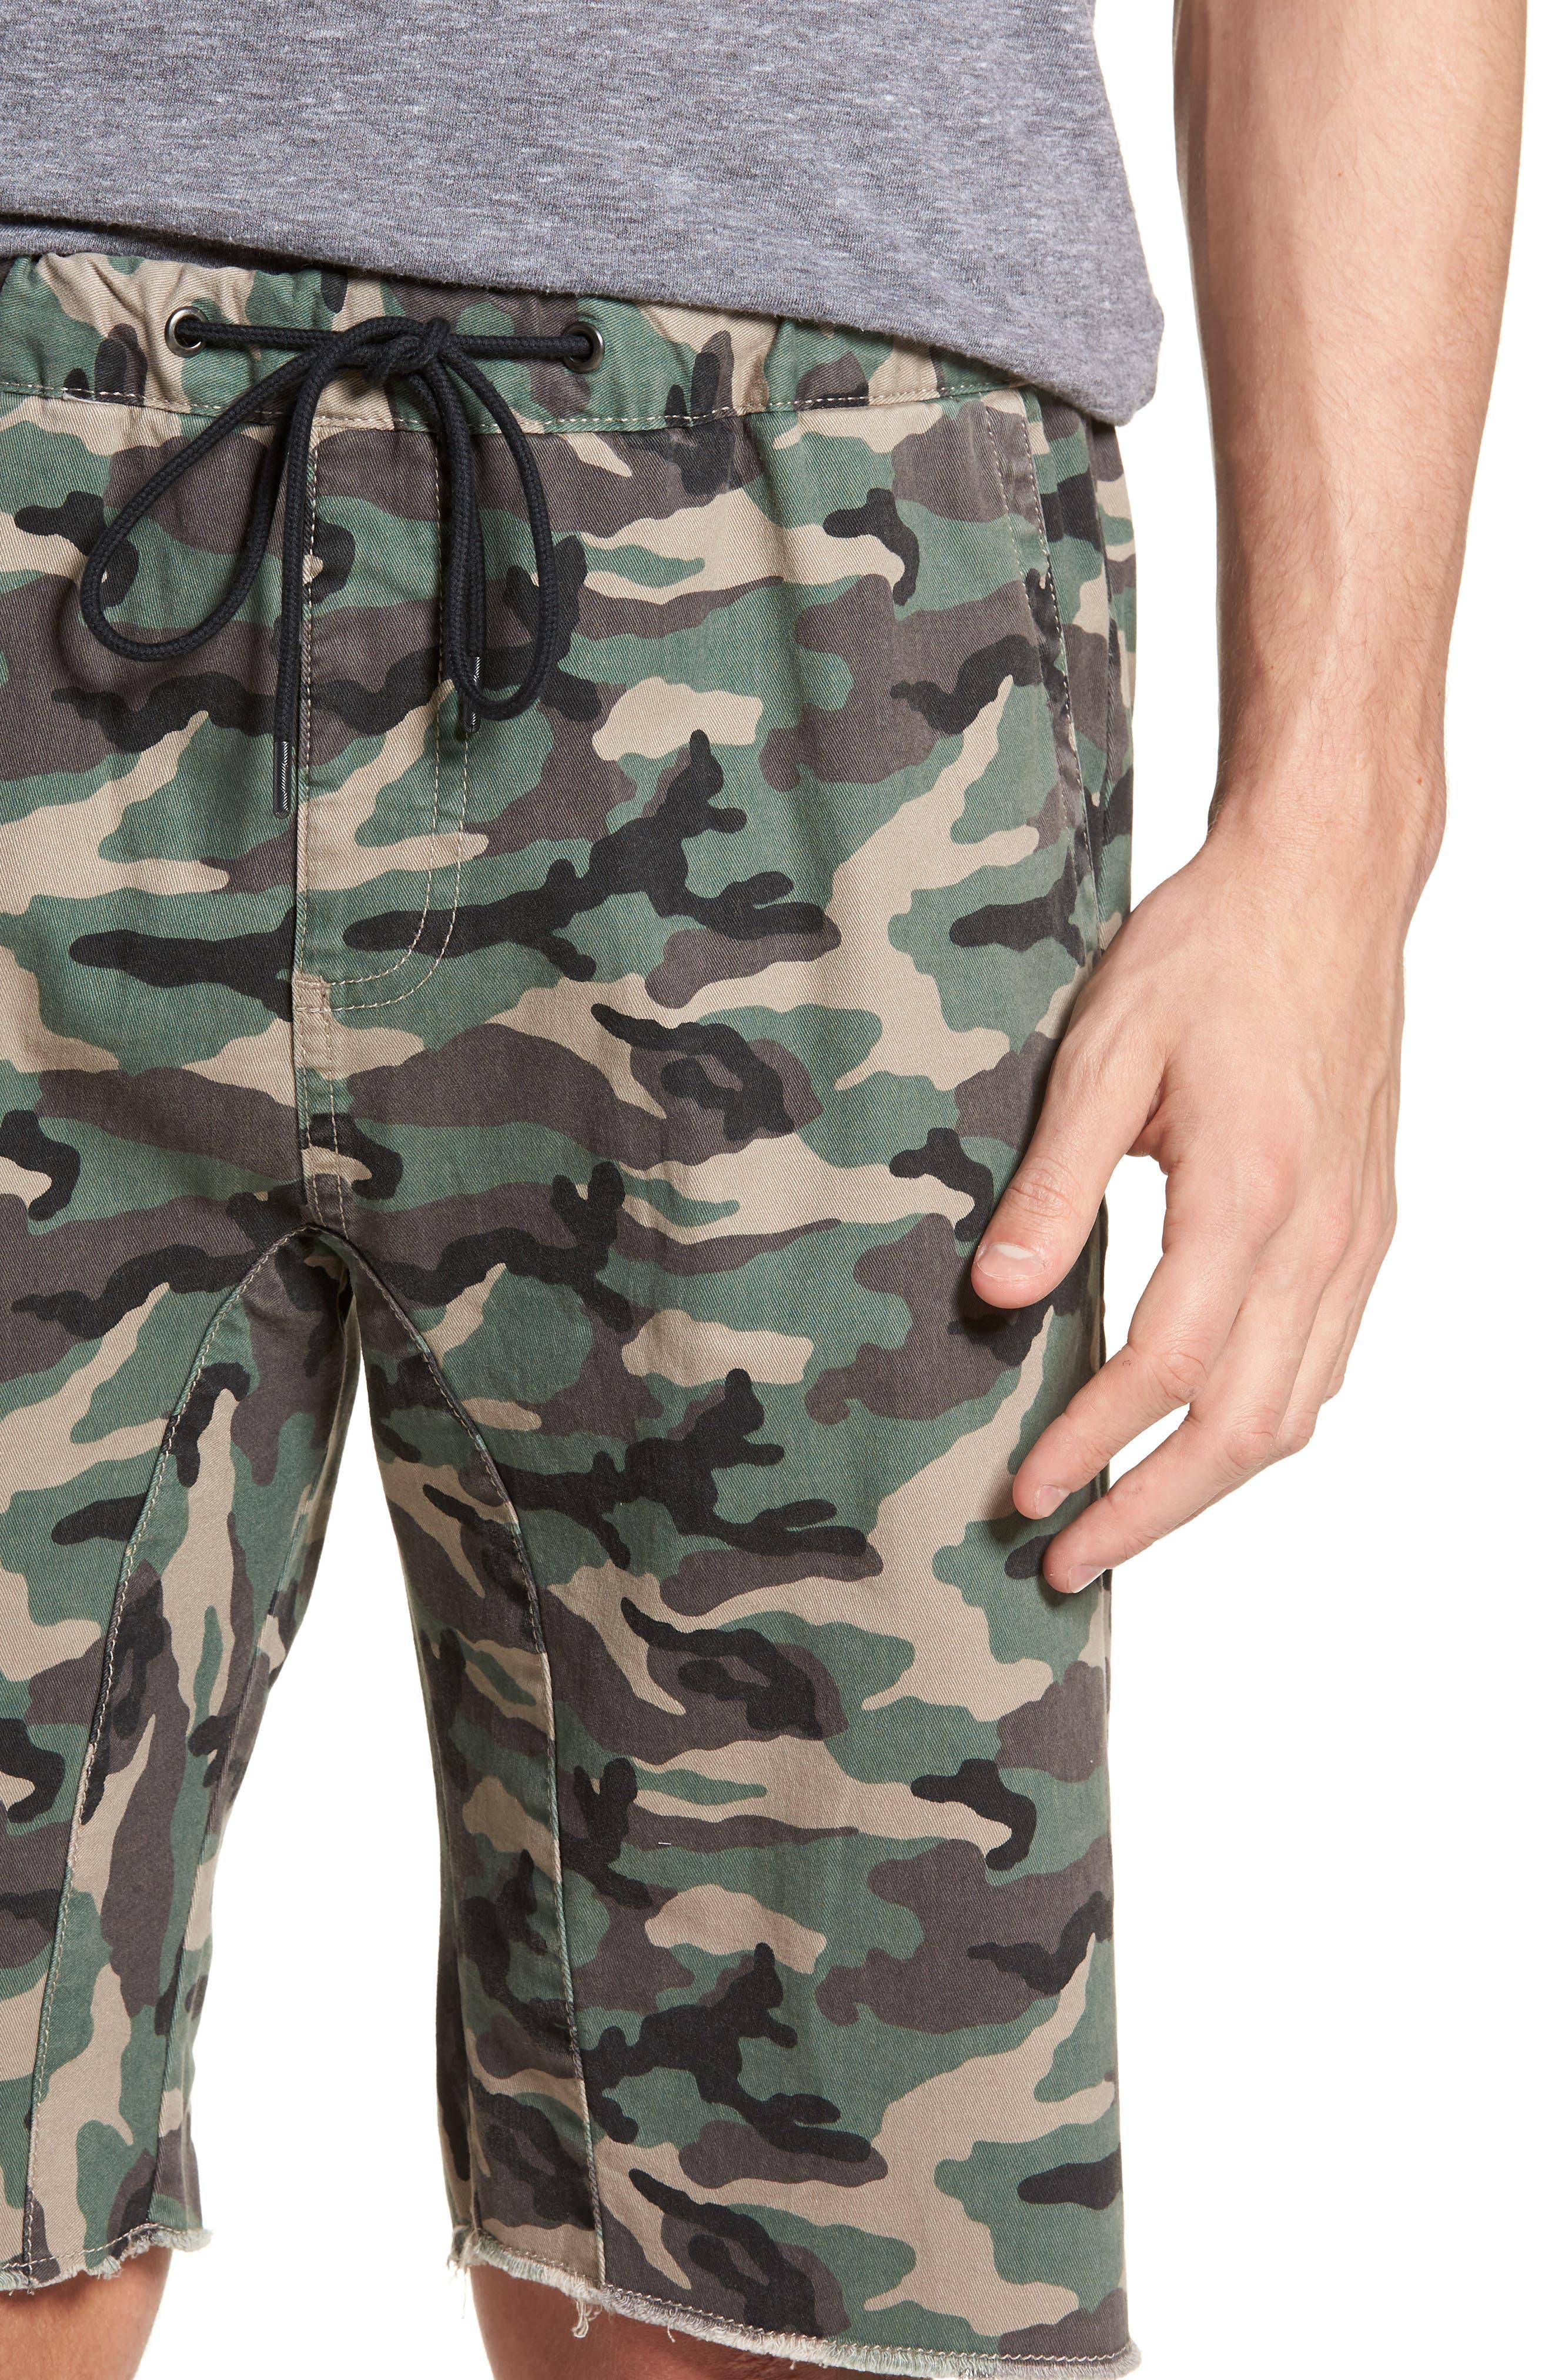 Camo Print Cutoff Twill Shorts,                             Alternate thumbnail 4, color,                             Brown Green Camo